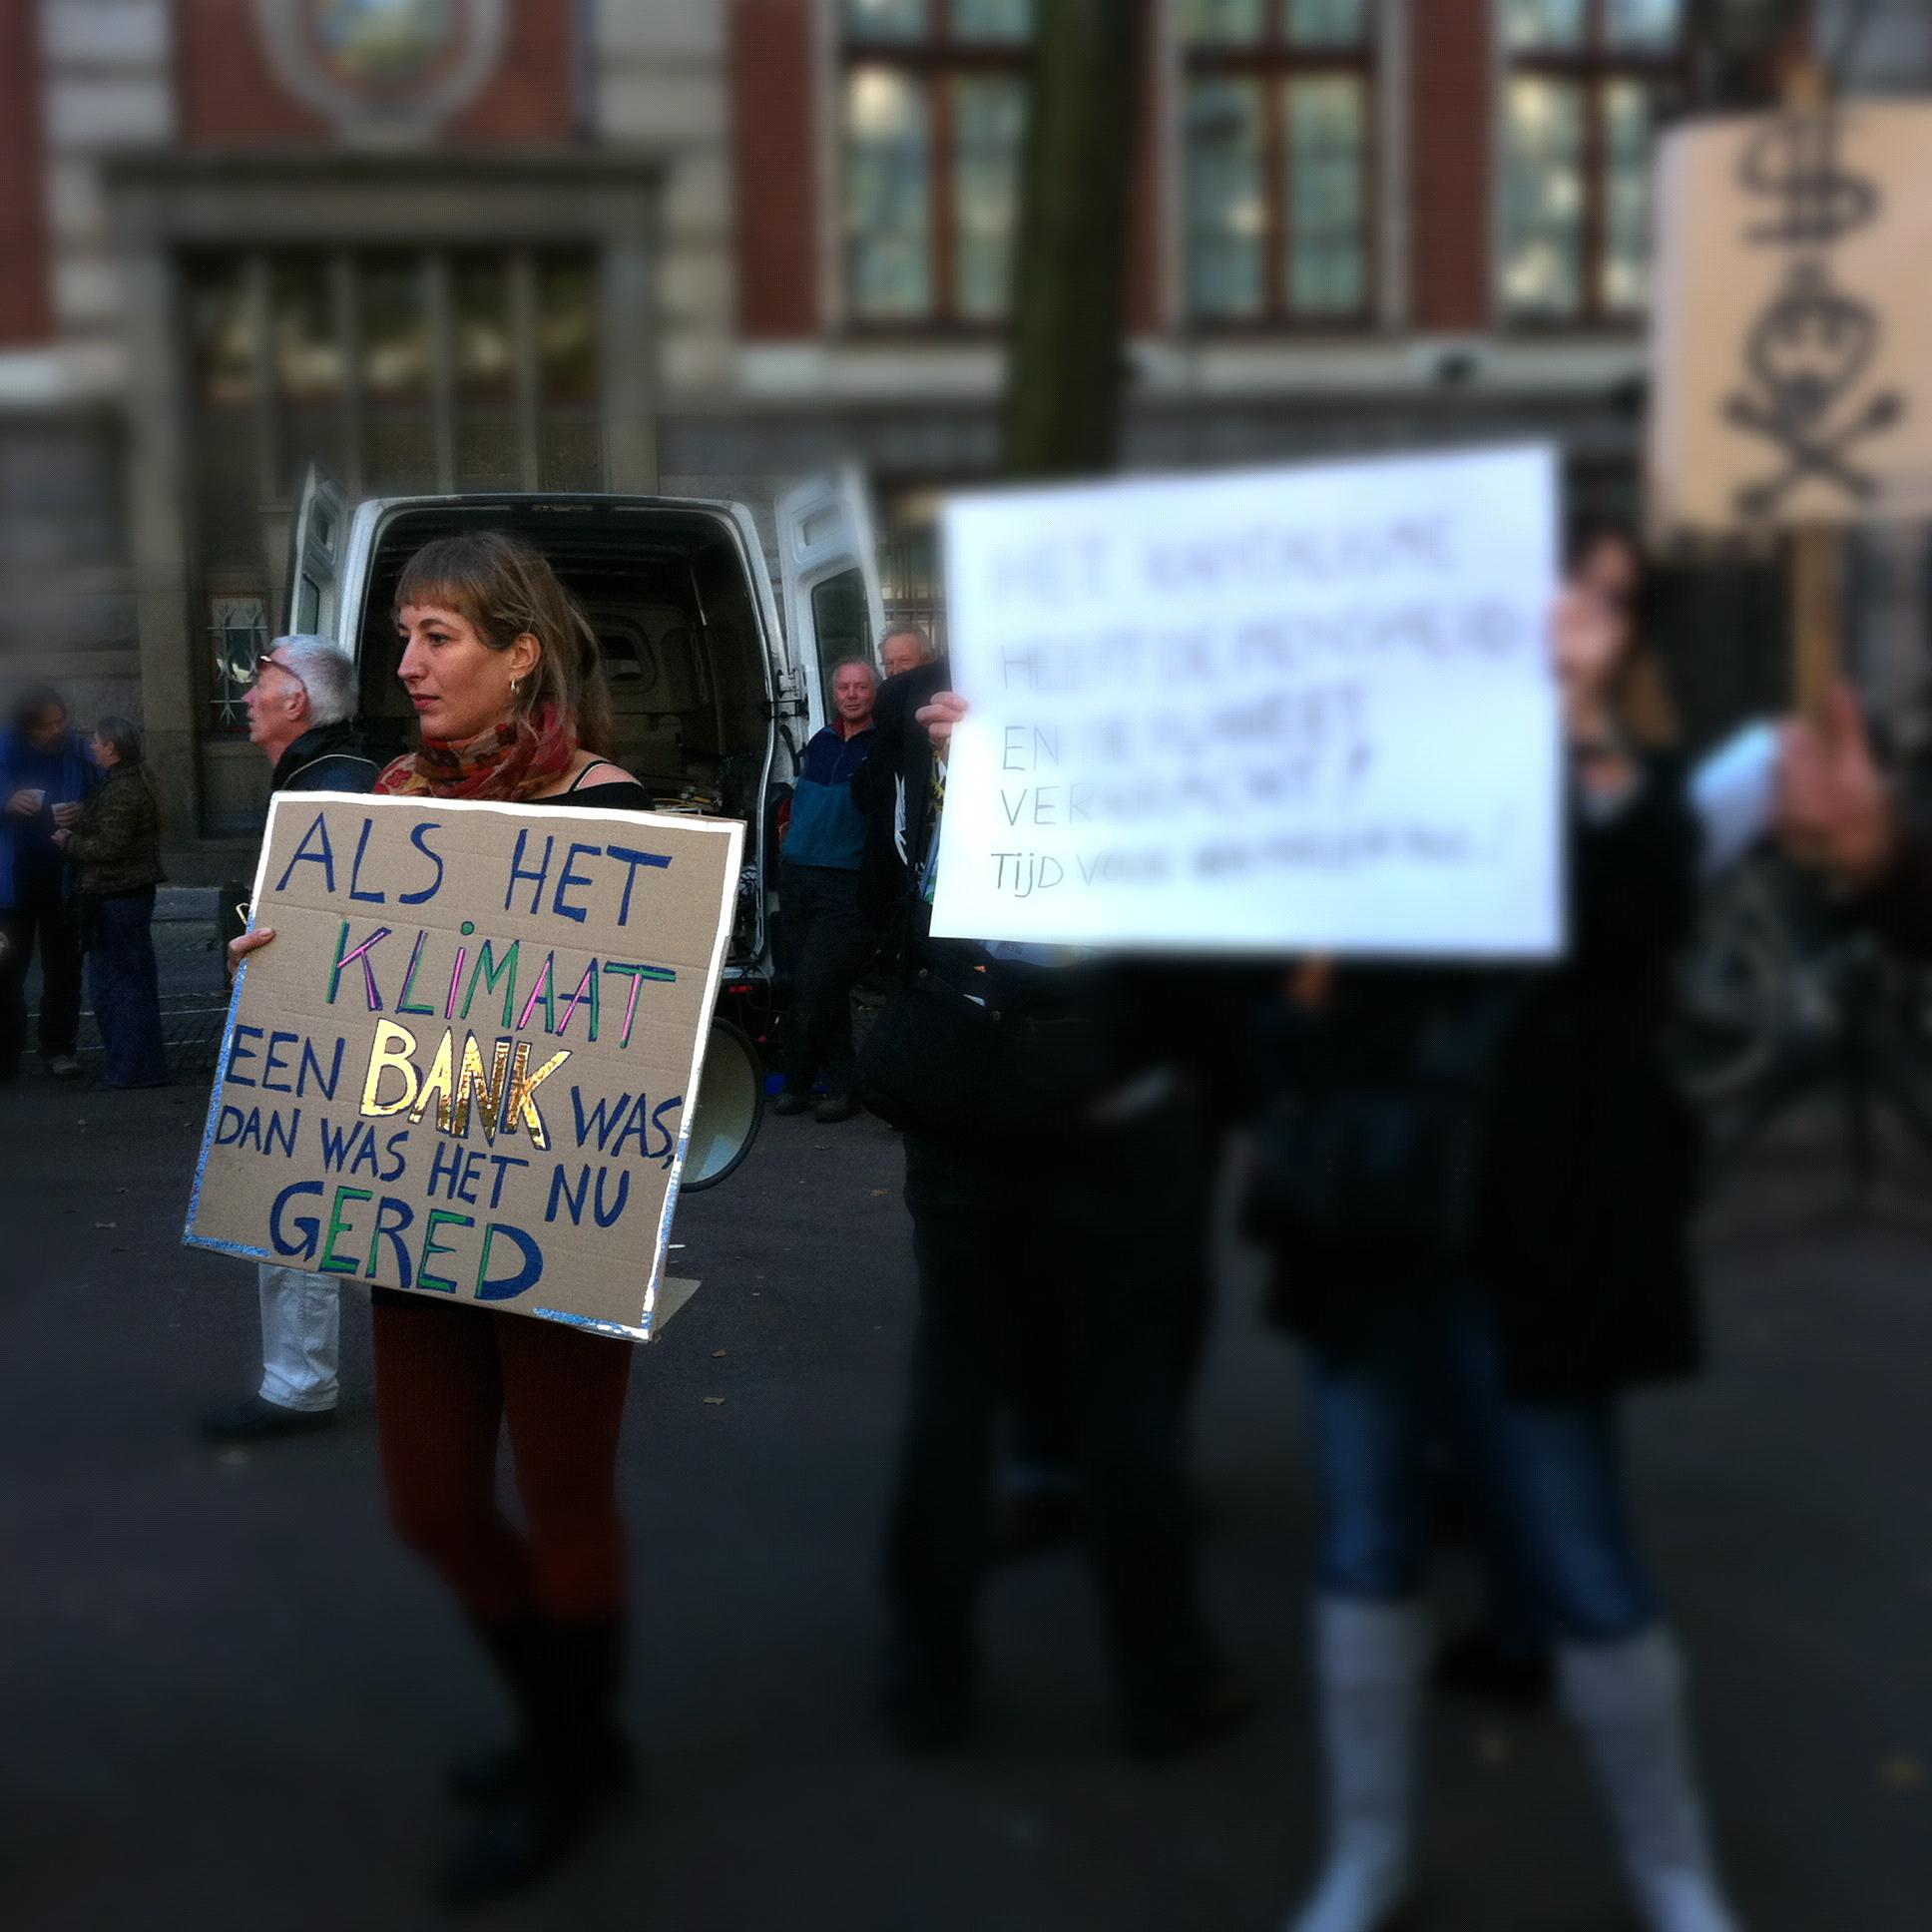 occupy Amsterdam 2